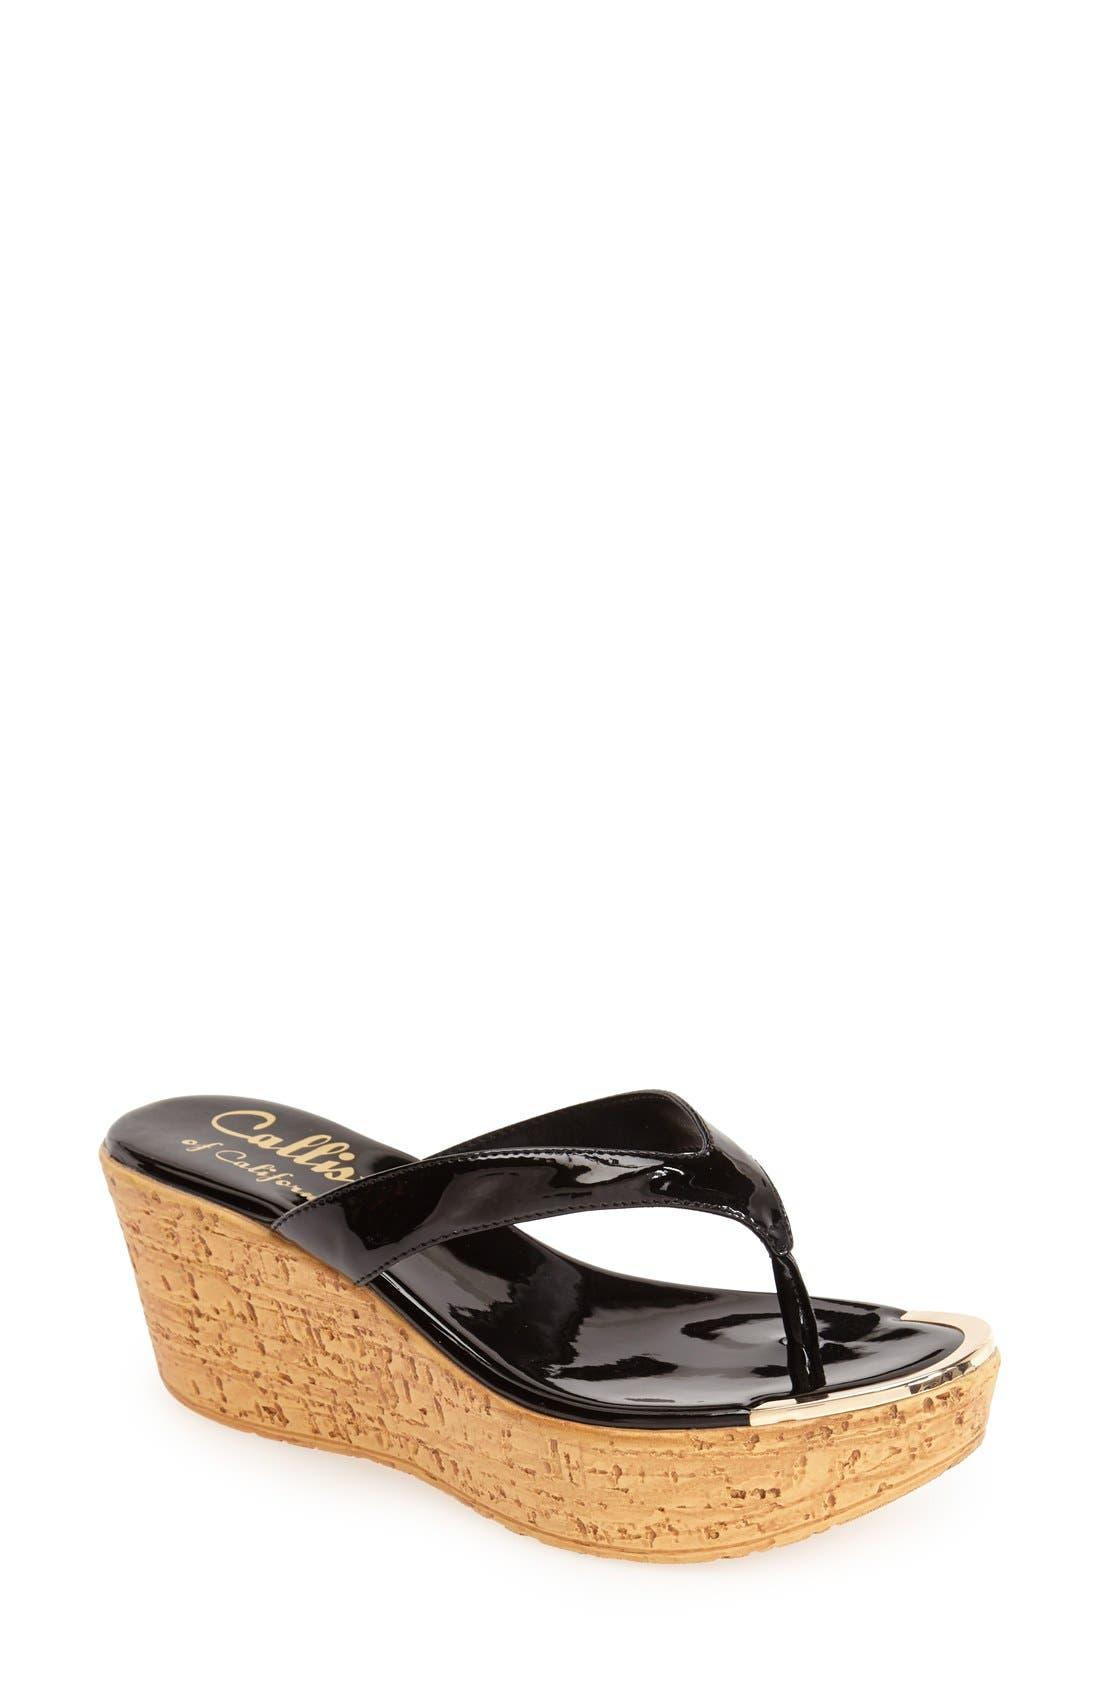 Alternate Image 1 Selected - Callisto 'Jaynie' Platform Thong Sandal (Women)